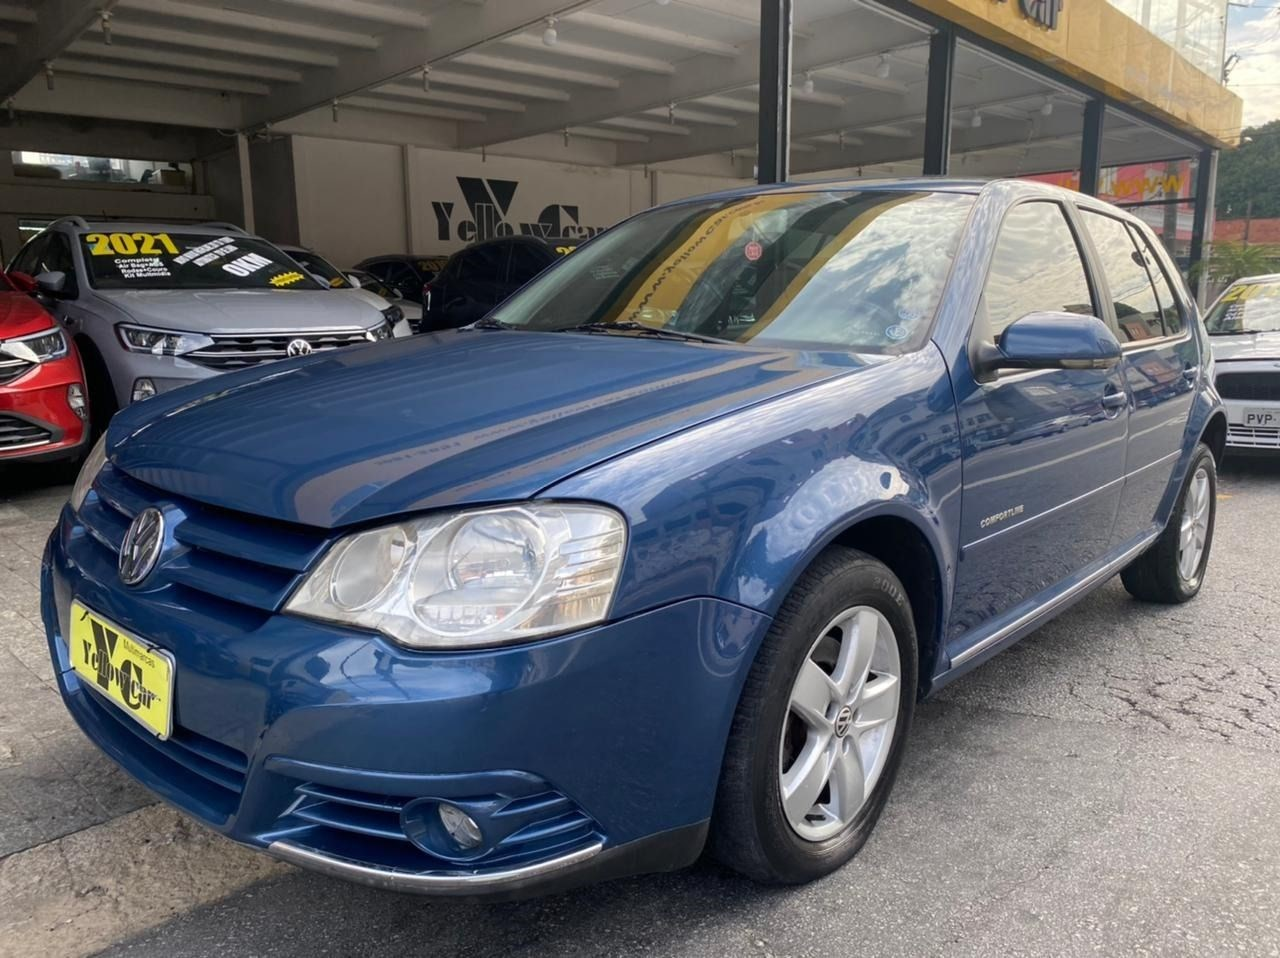 //www.autoline.com.br/carro/volkswagen/golf-20-comfortline-8v-gasolina-4p-tiptronic/2008/sao-paulo-sp/14056760